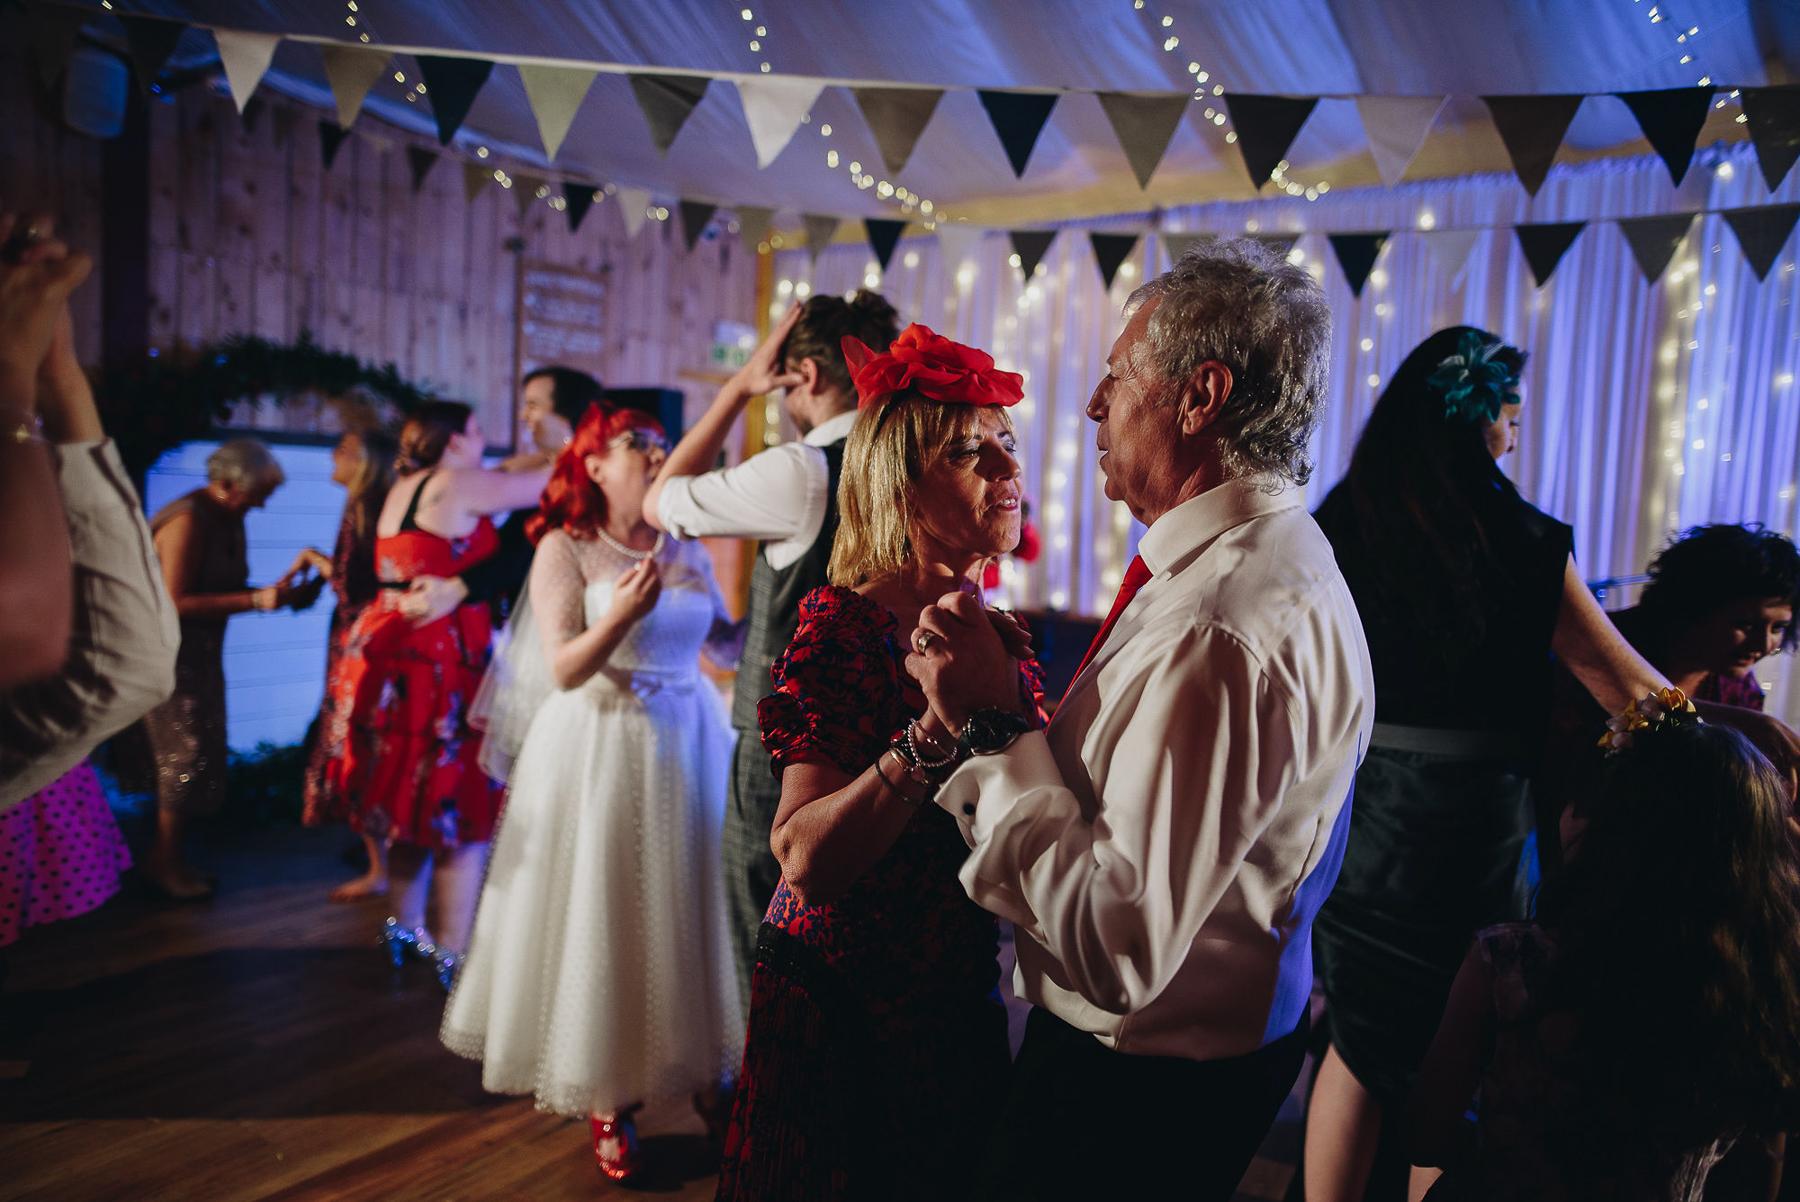 Wellbeing_Farm_Wedding_Photography_The_Pin-Up_Bride_Lara_Shaun-146.jpg